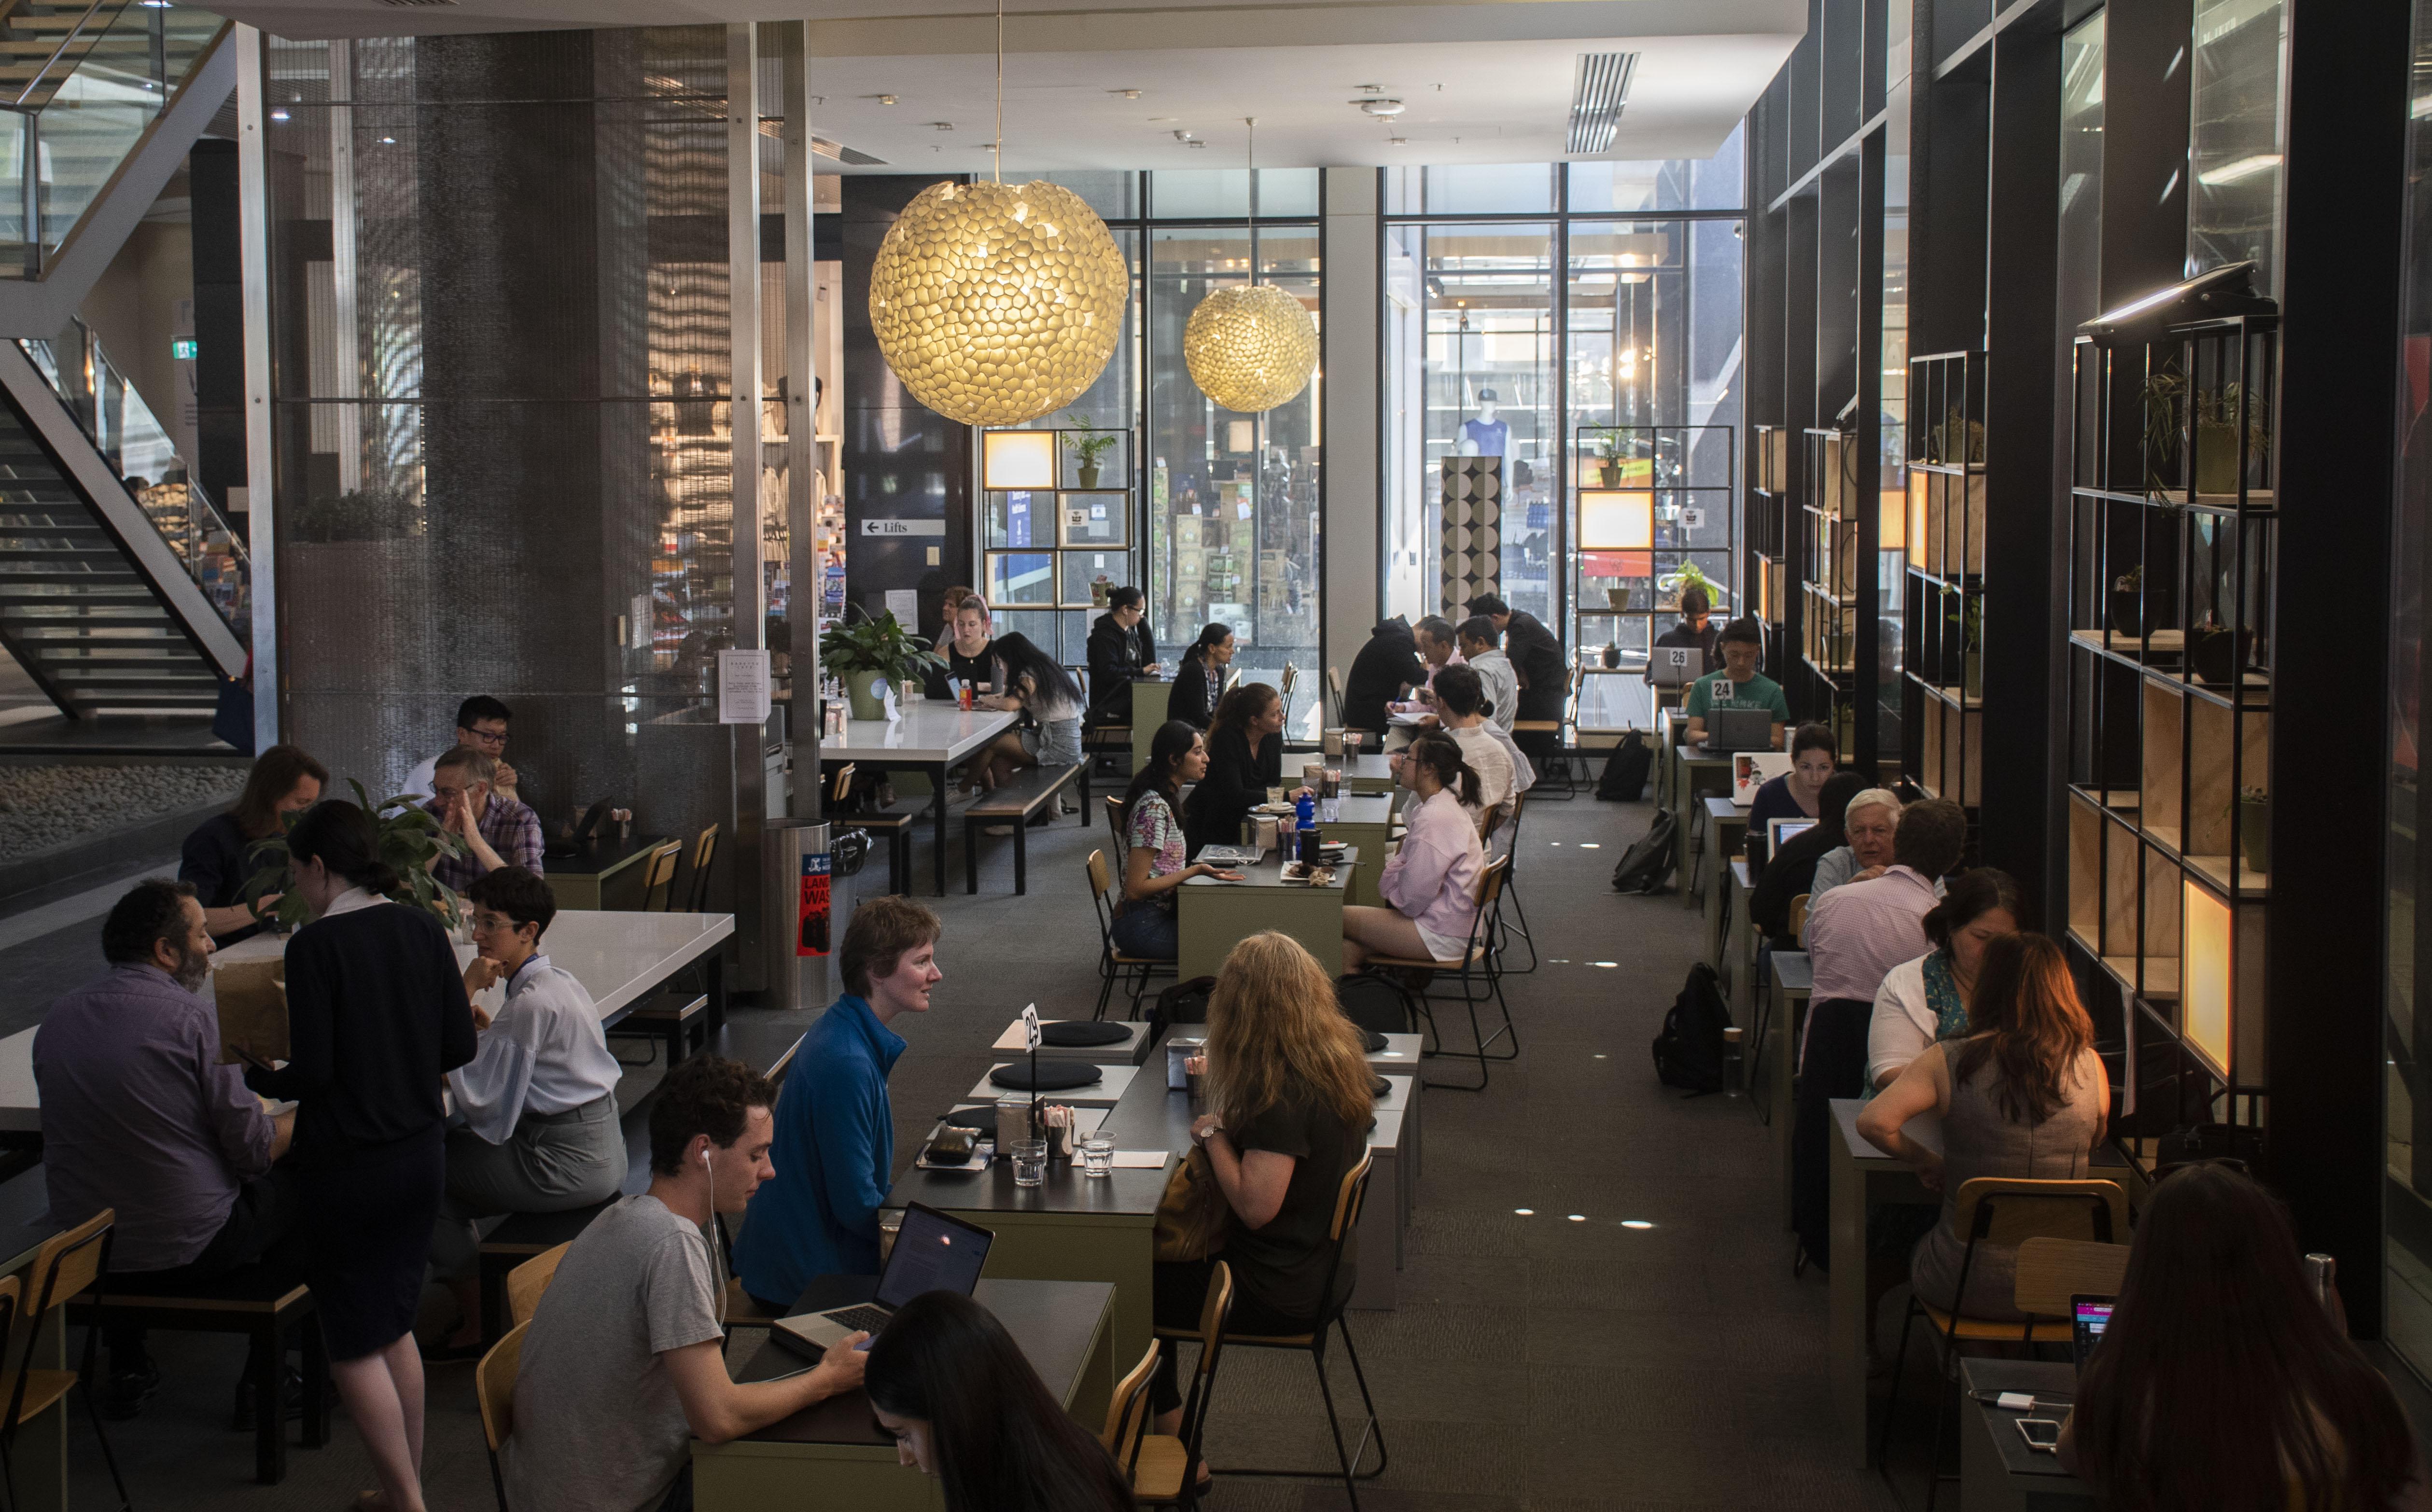 Coffee drinkers inside the Baretto Espresso Coffee store on Barry Street in Carlton.